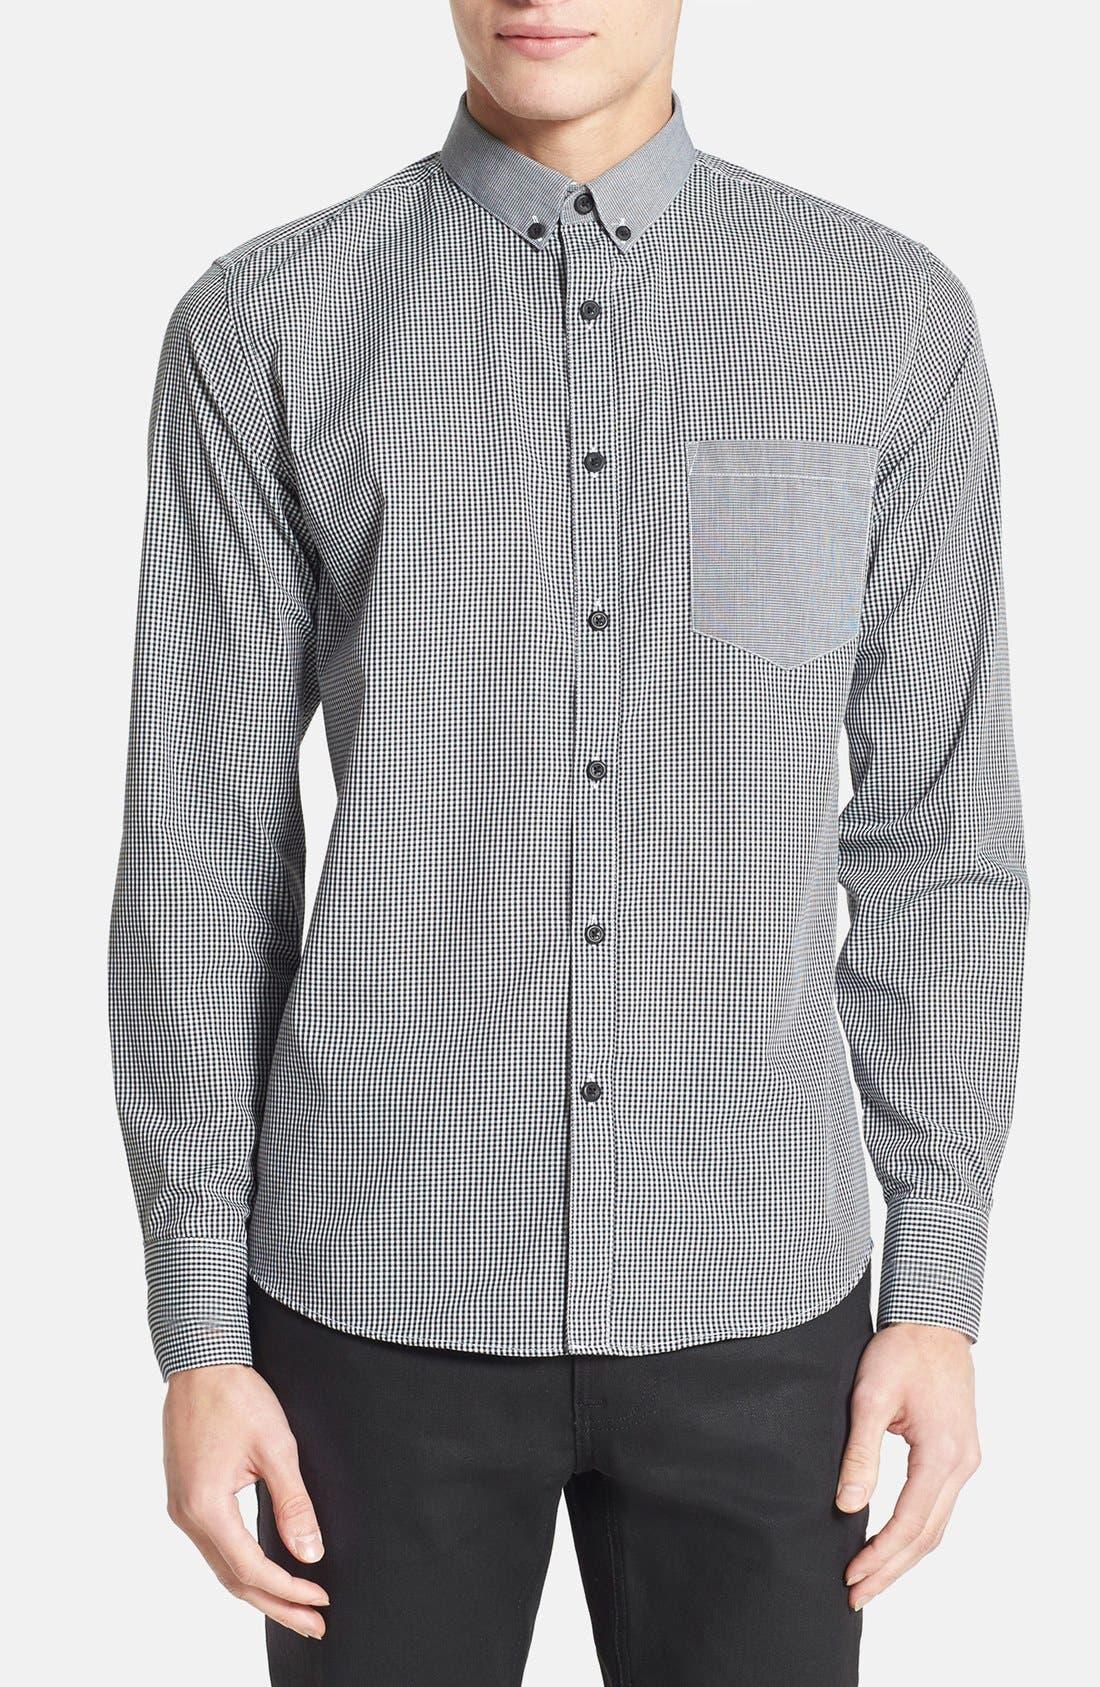 Main Image - Topman Slim Fit Mixed Gingham Dress Shirt